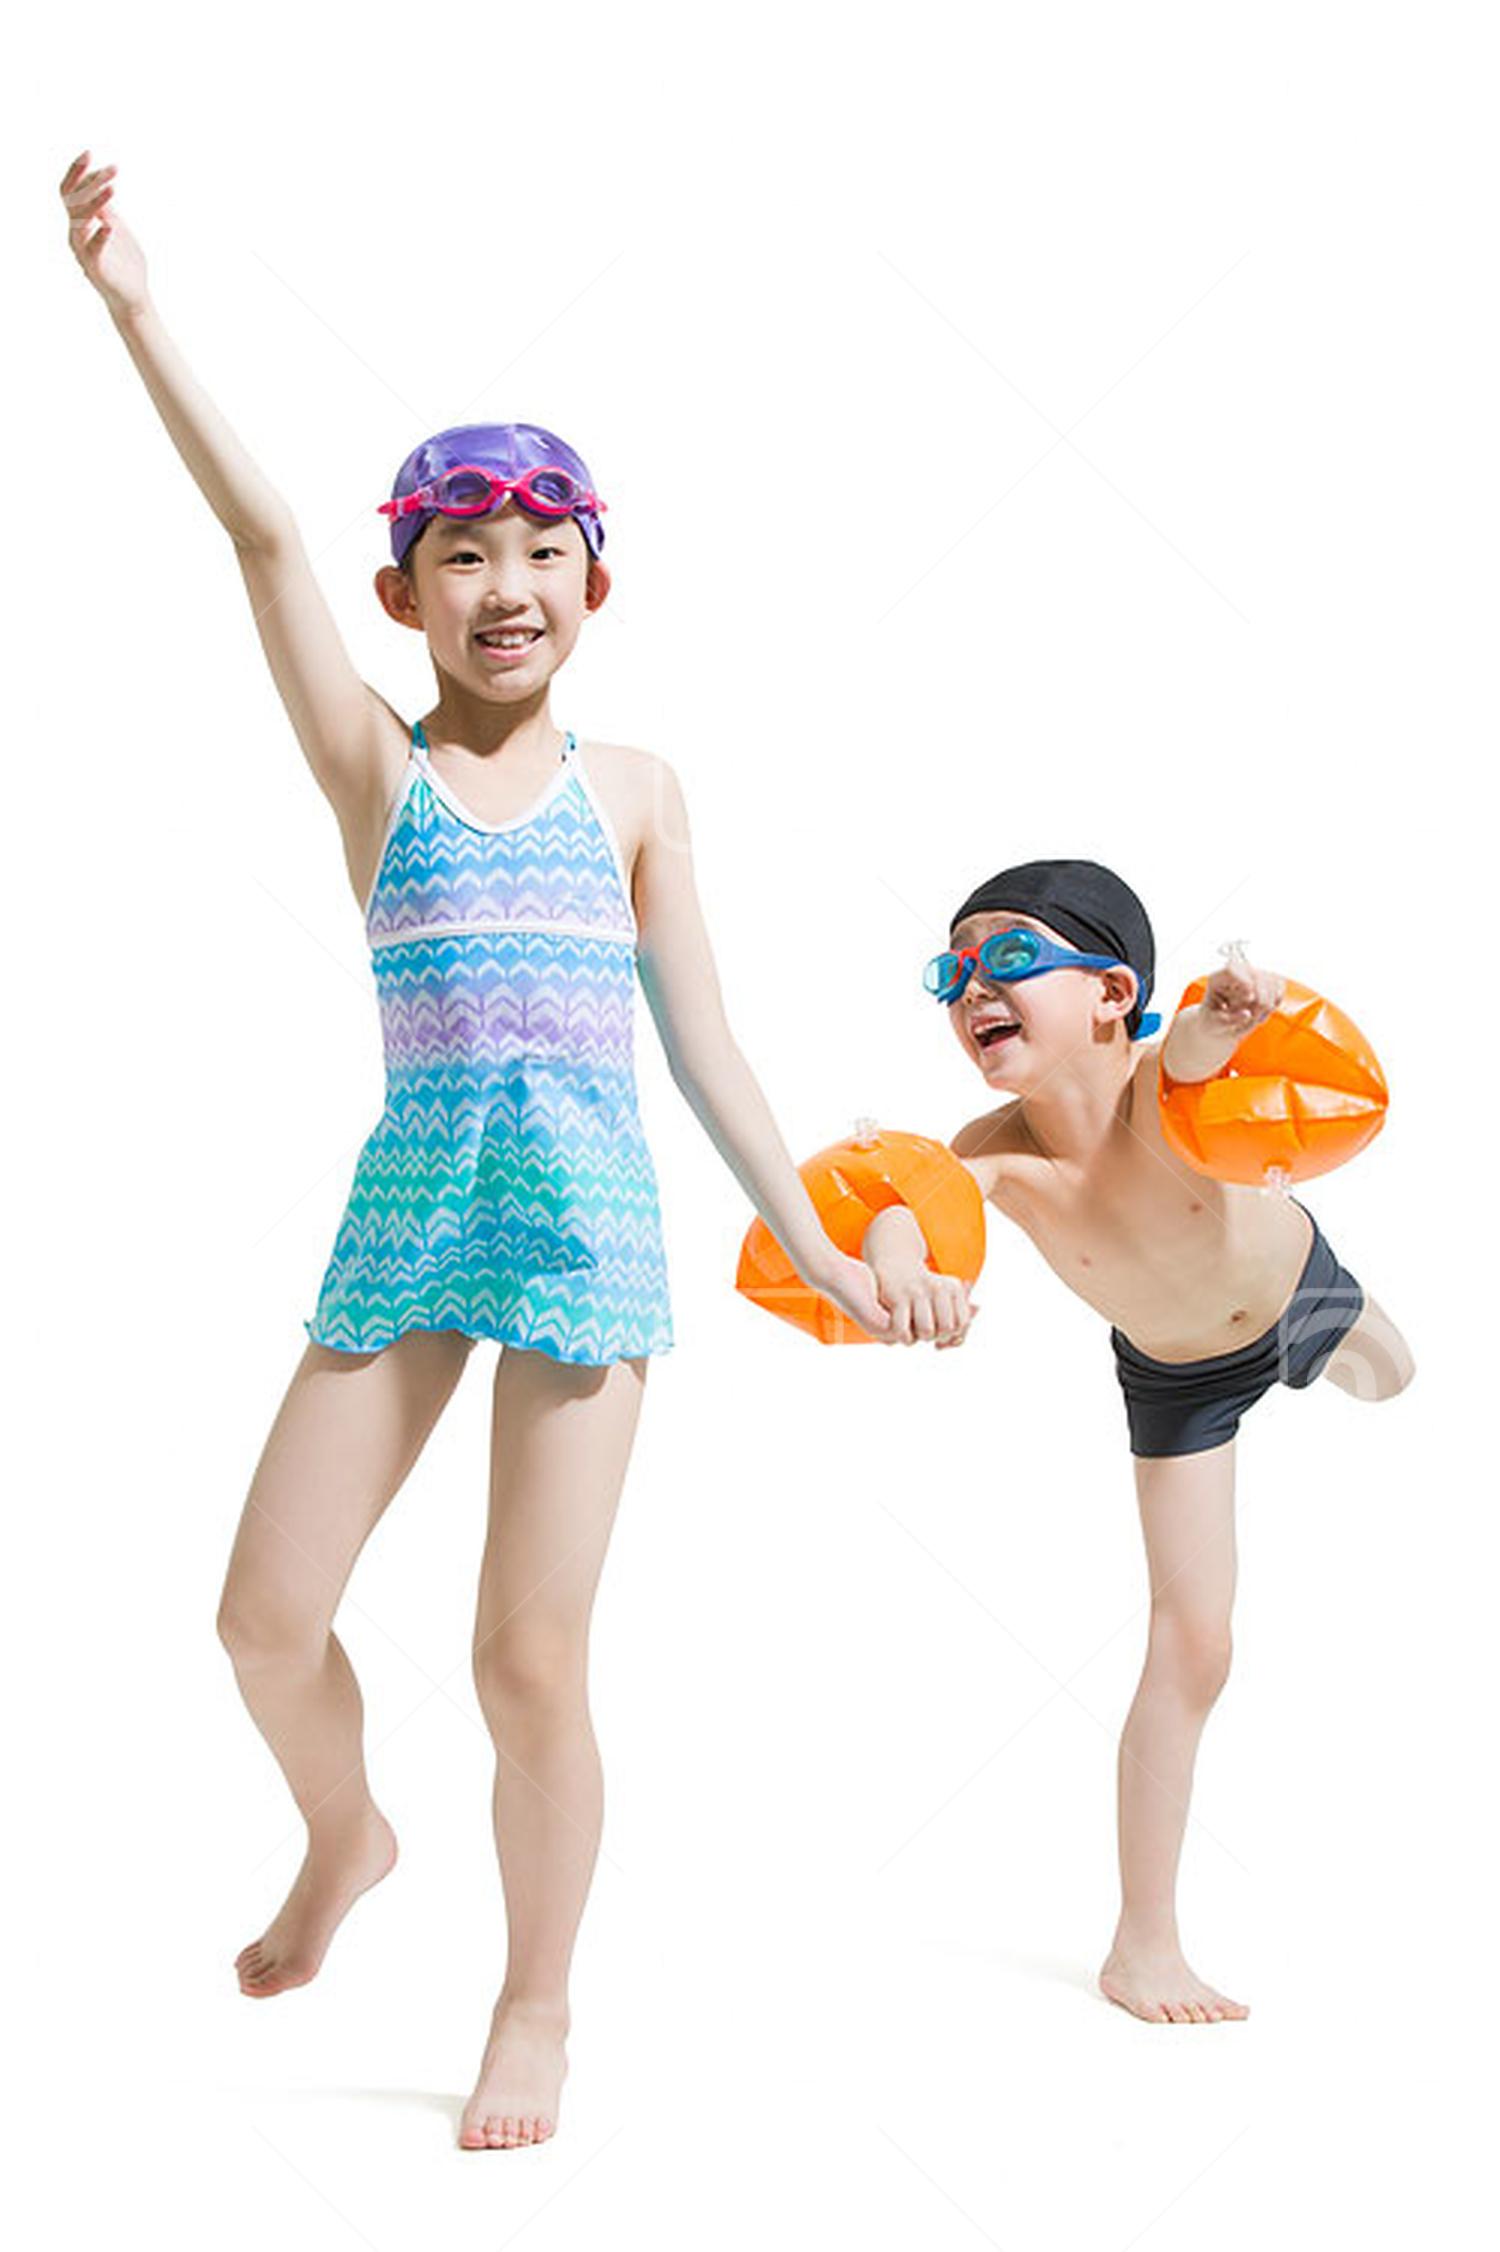 Cute Chinese children in swimsuit running